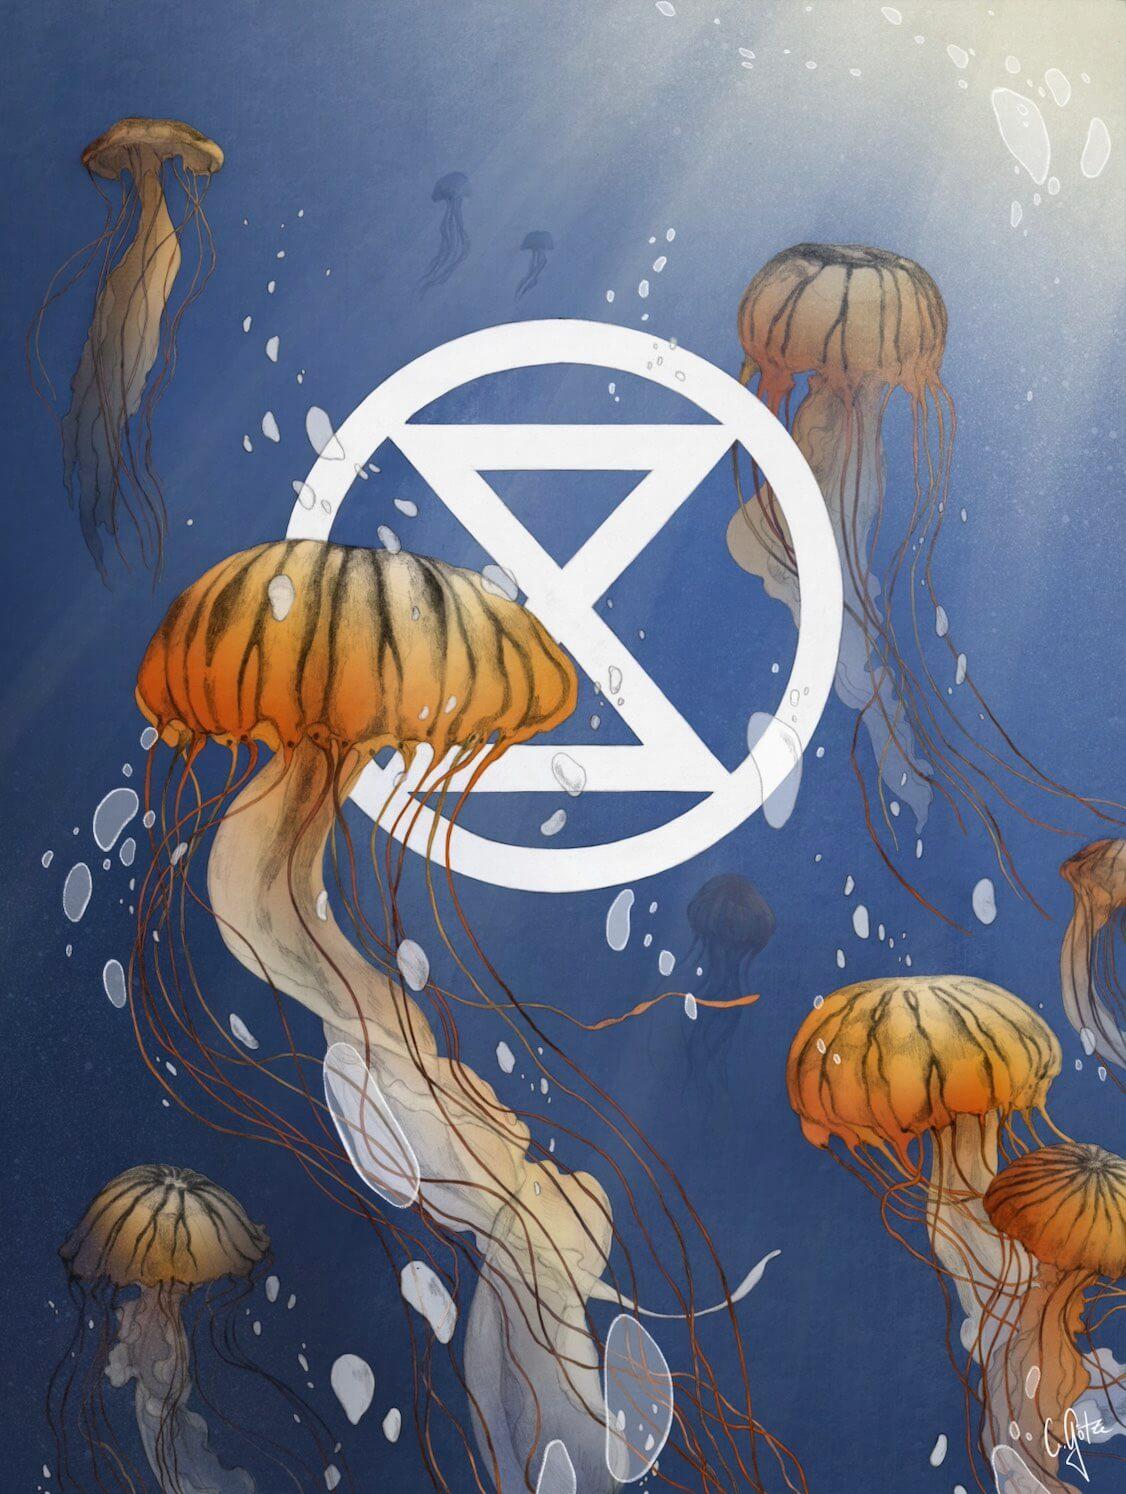 XR Symbol with jellyfish